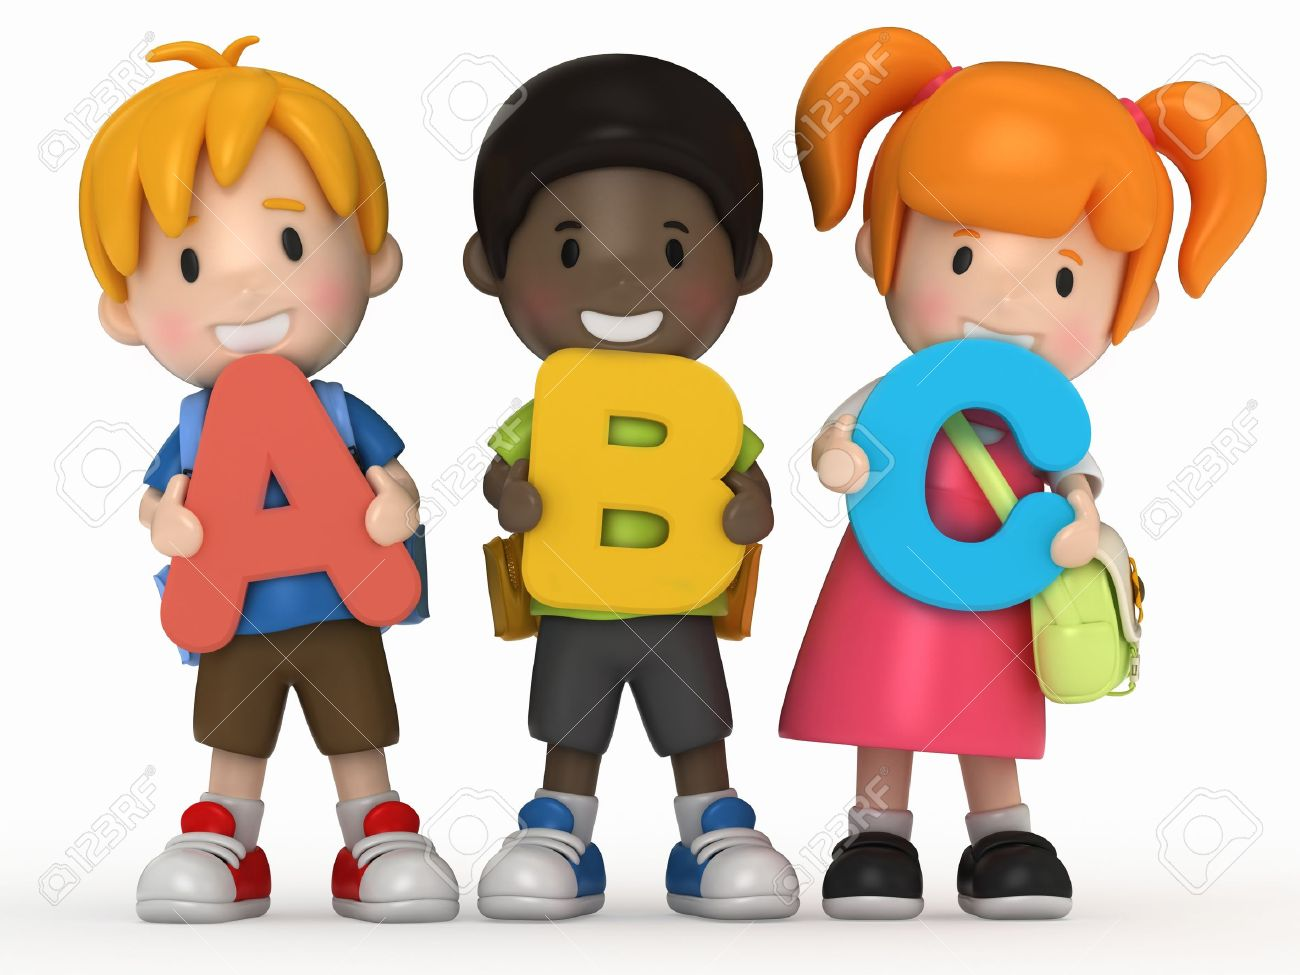 Free pictures clipartix cliparts. Abc clipart childrens